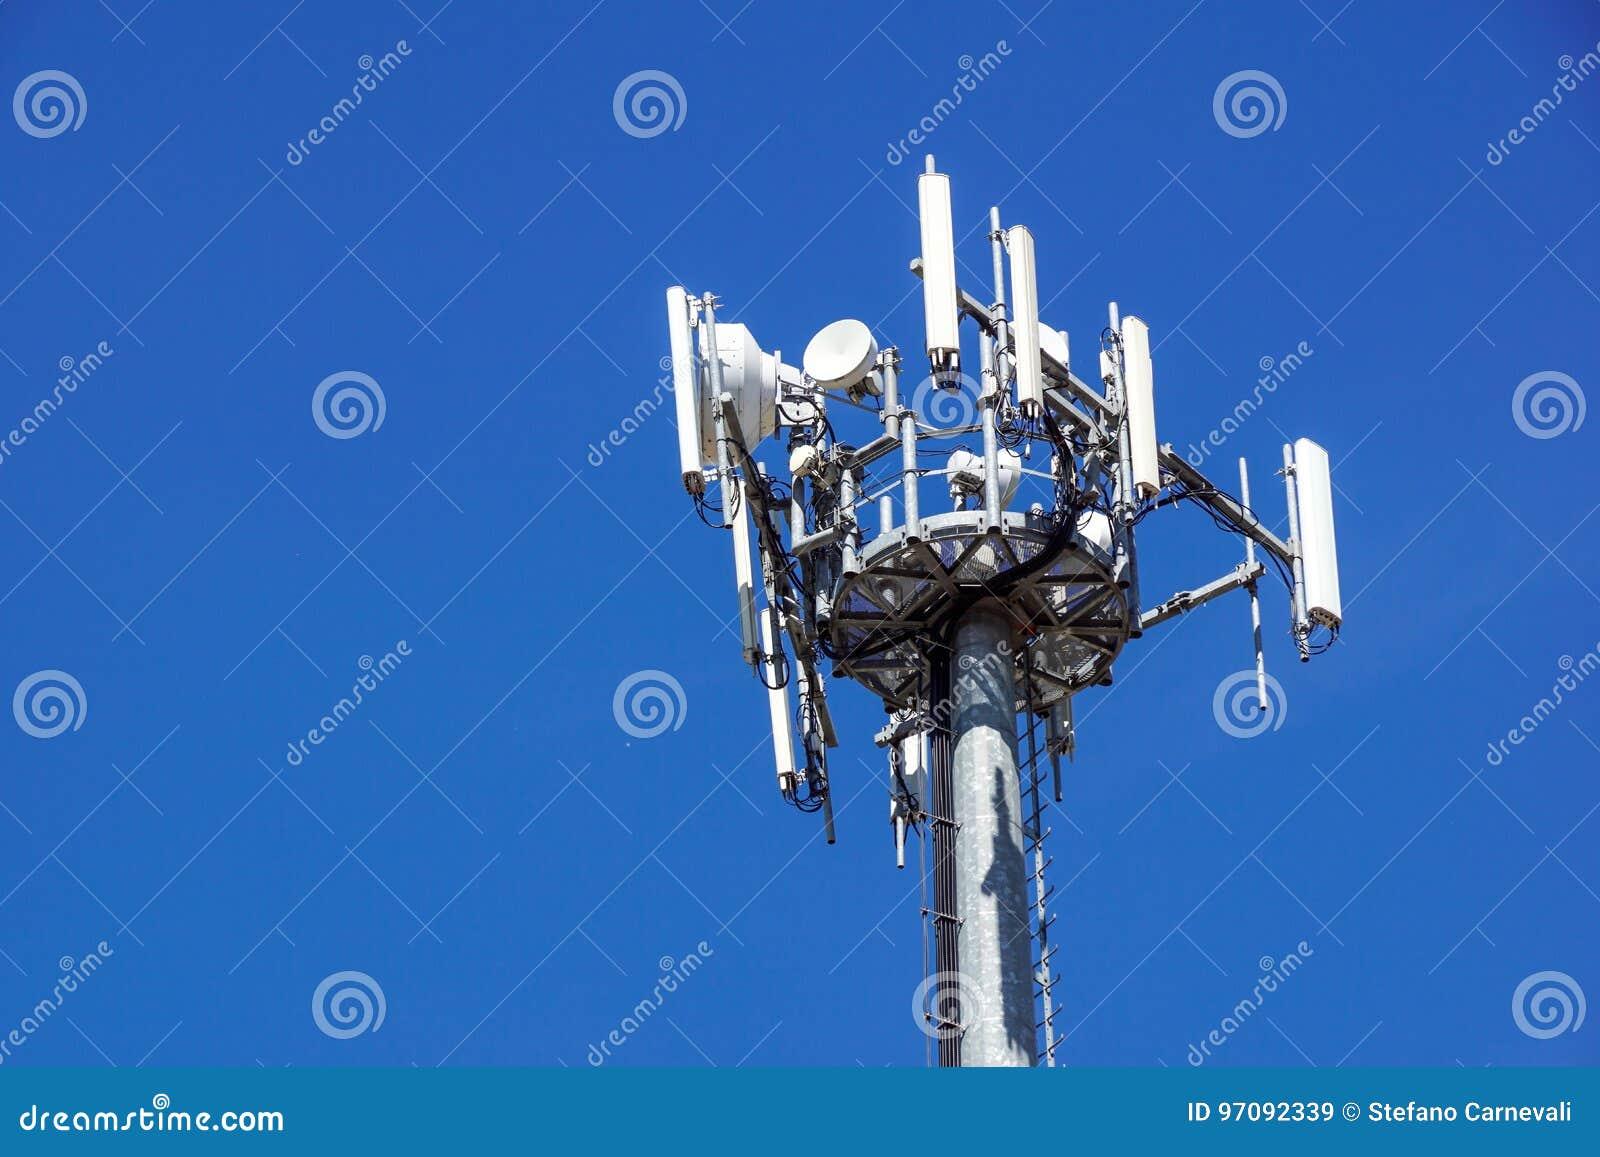 Parte superior de la torre de comunicación del teléfono celular con las antenas múltiples contra un cielo azul